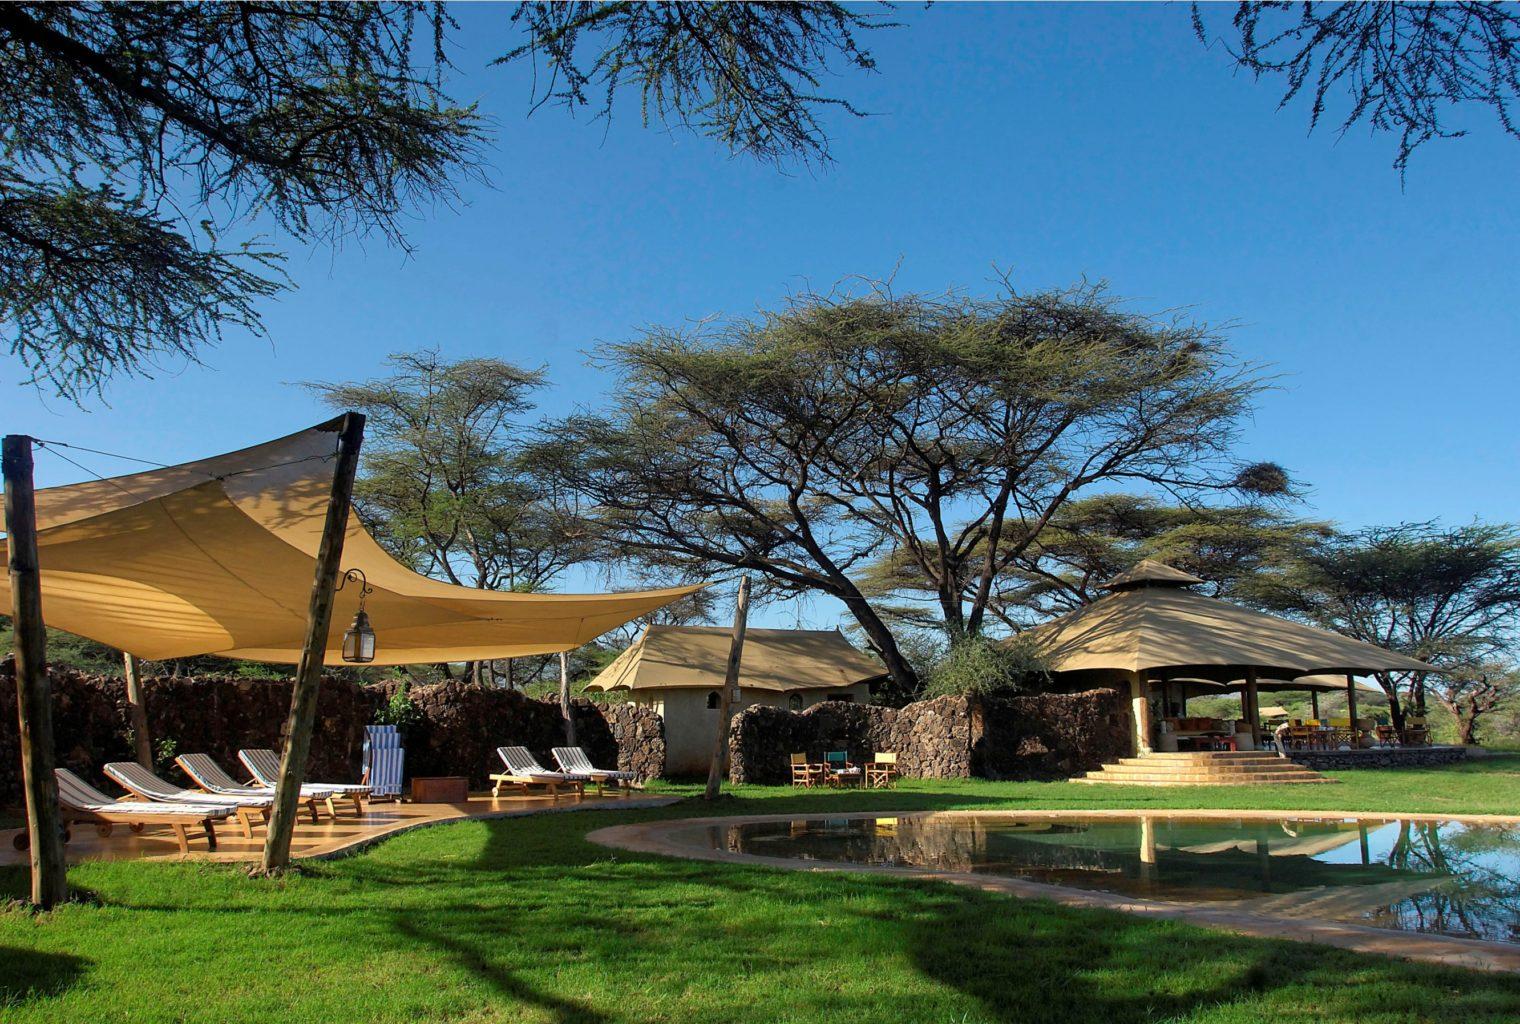 Joys Camp Kenya Exterior Daytime